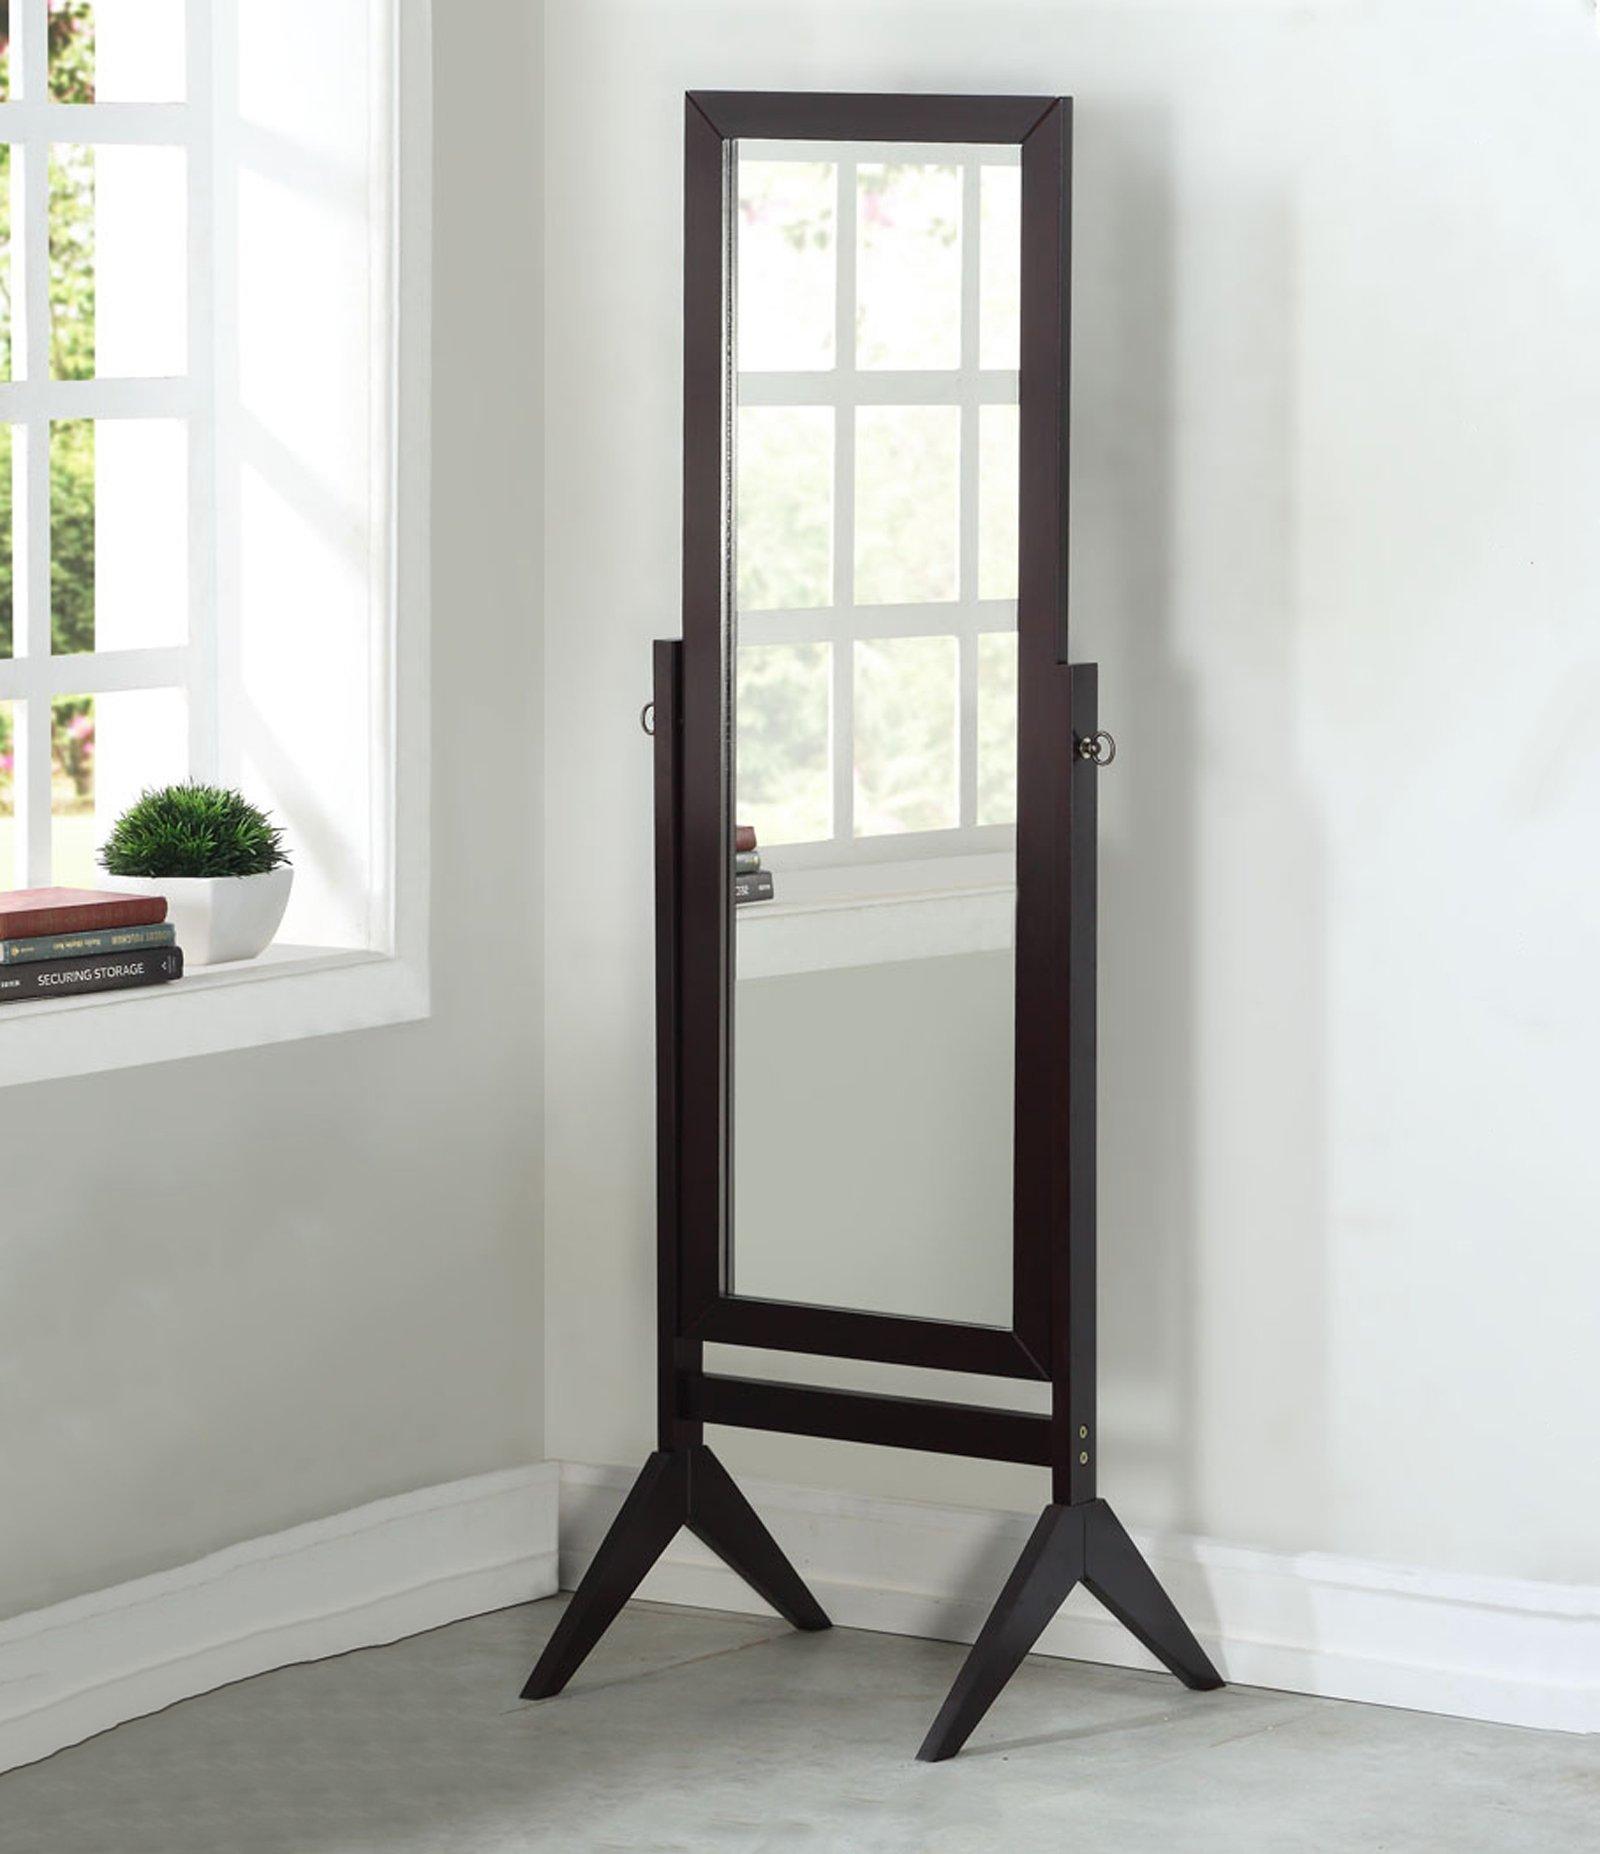 Legacy Decor Wooden Rectangle Cheval Floor Mirror, Free Standing Mirror, Espresso Finish